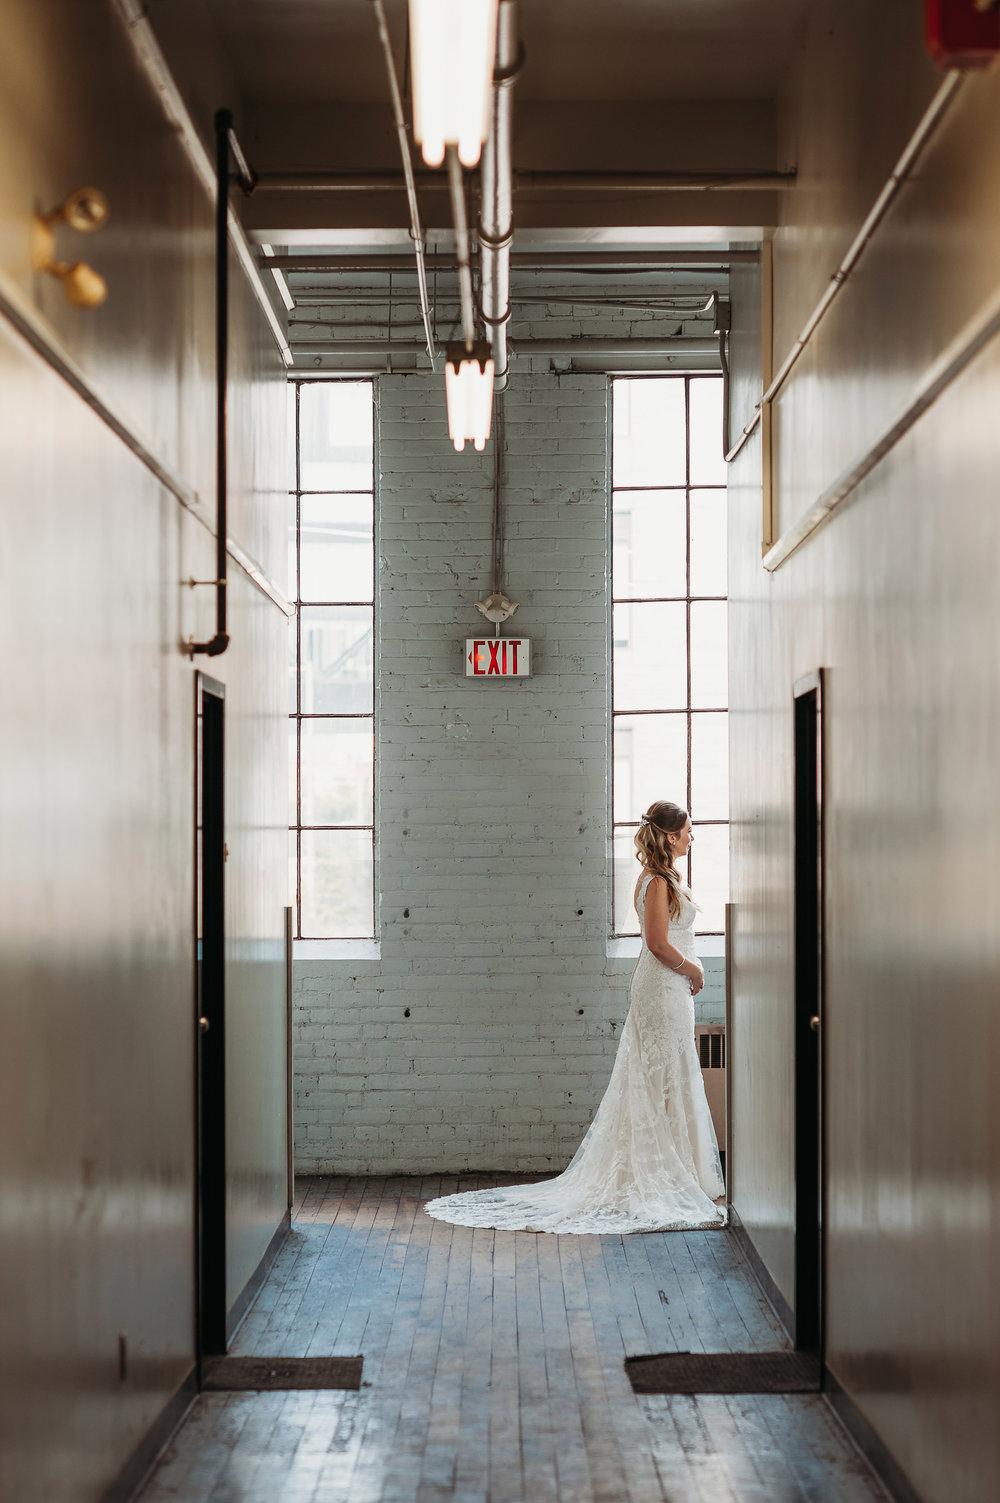 bride-portrait-toronto-rustic-boho-airship37-wedding-by-willow-birch-photo-toronto-documentary-wedding-photographers.jpg